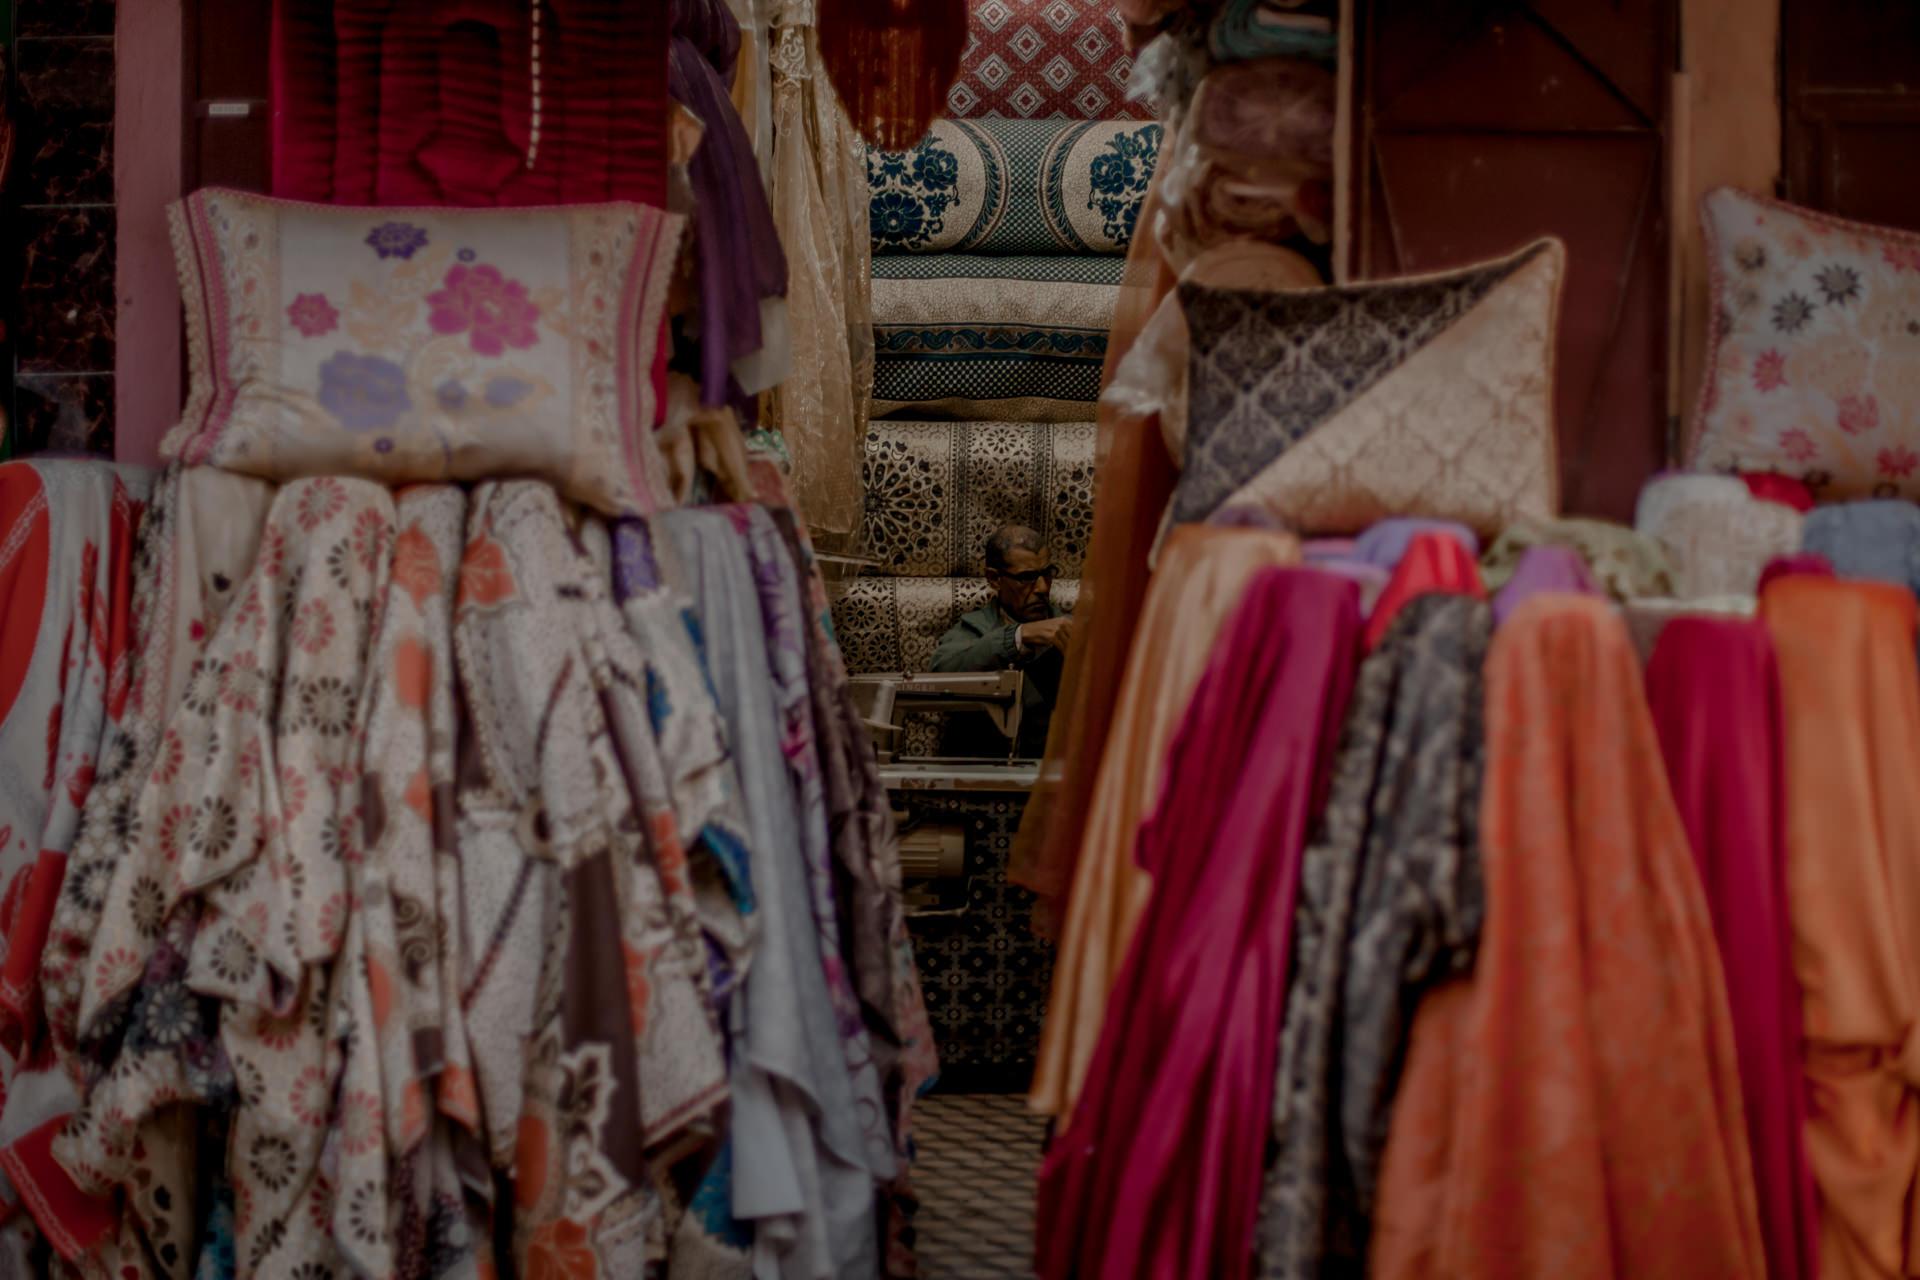 Suk w Marrakeszu